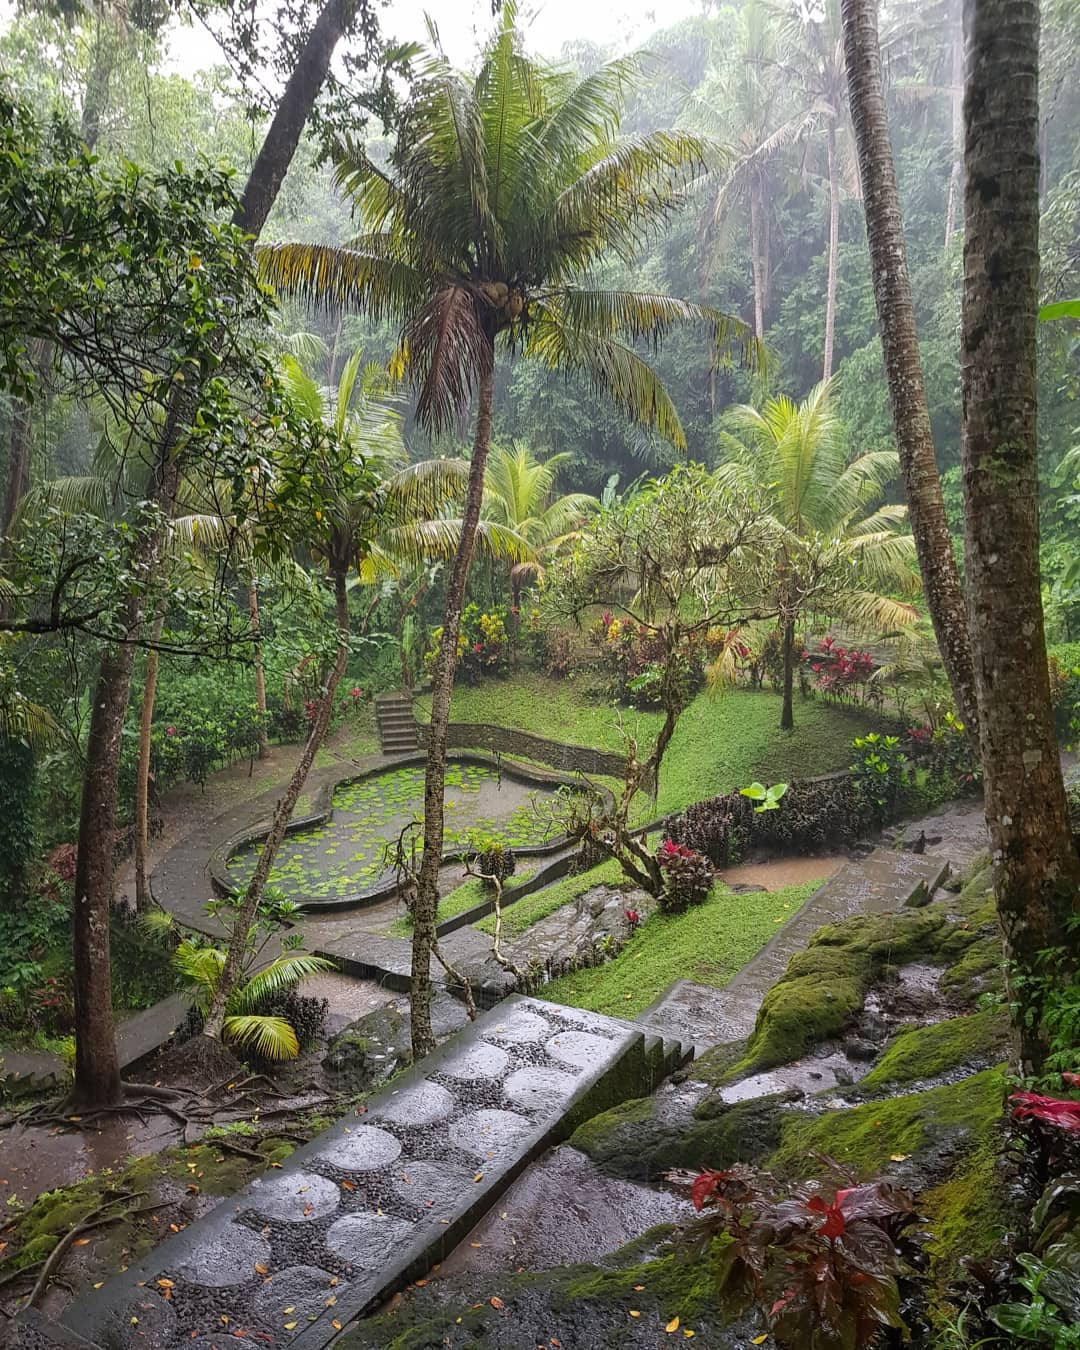 Goa Gajah Bali Indahnya Peninggalan Wisata Sejarah History Entrance Fee